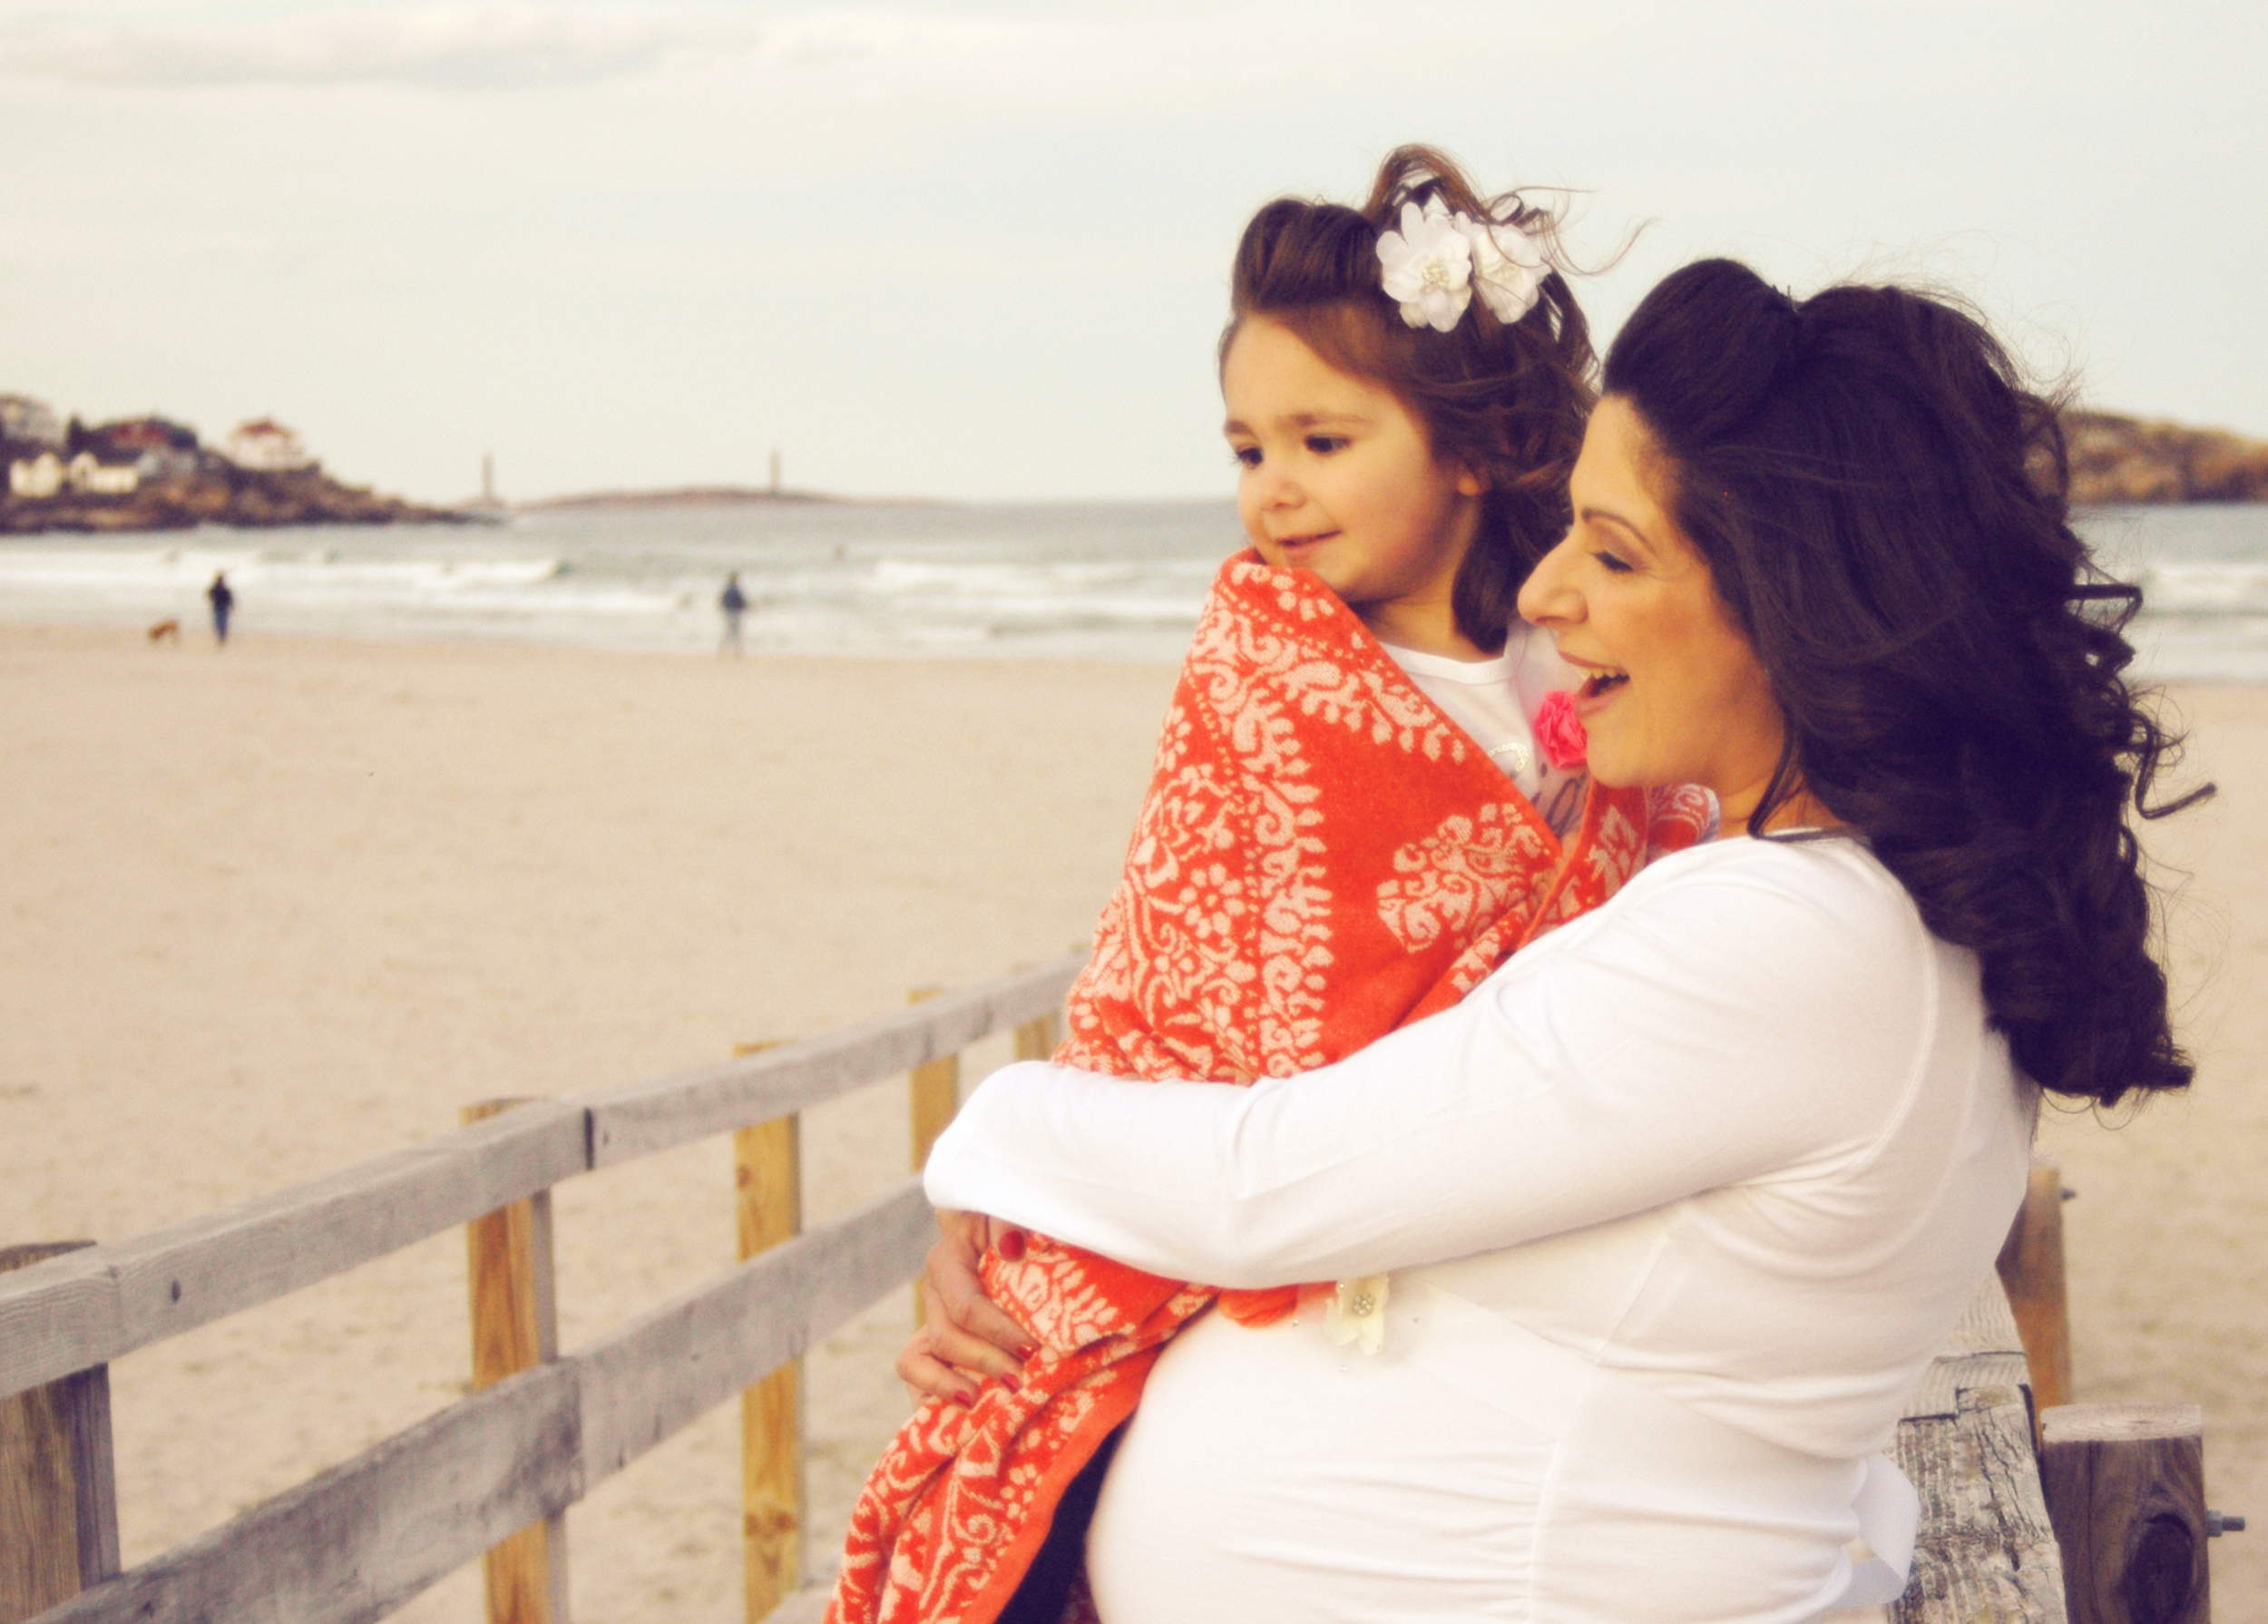 mother-daughter-maternity-beach-portrait